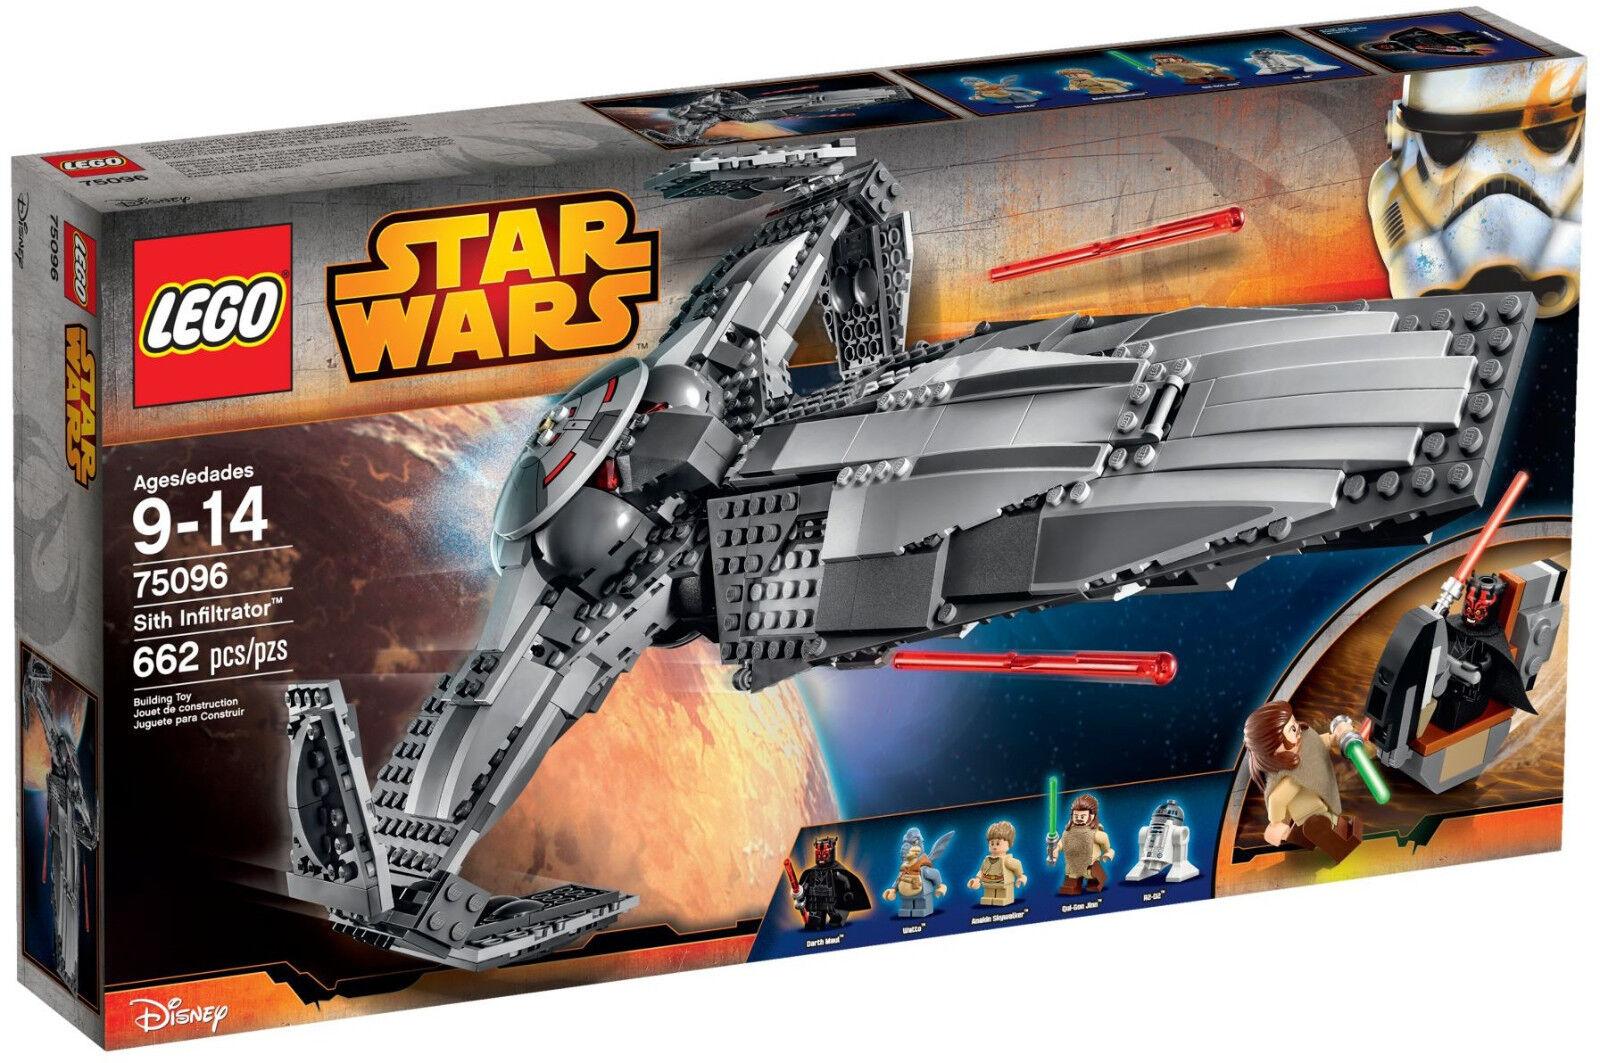 LEGO Star Wars - 75096 Sith Infiltrator con Watto e Qui-Gon Jinn-NUOVO & OVP